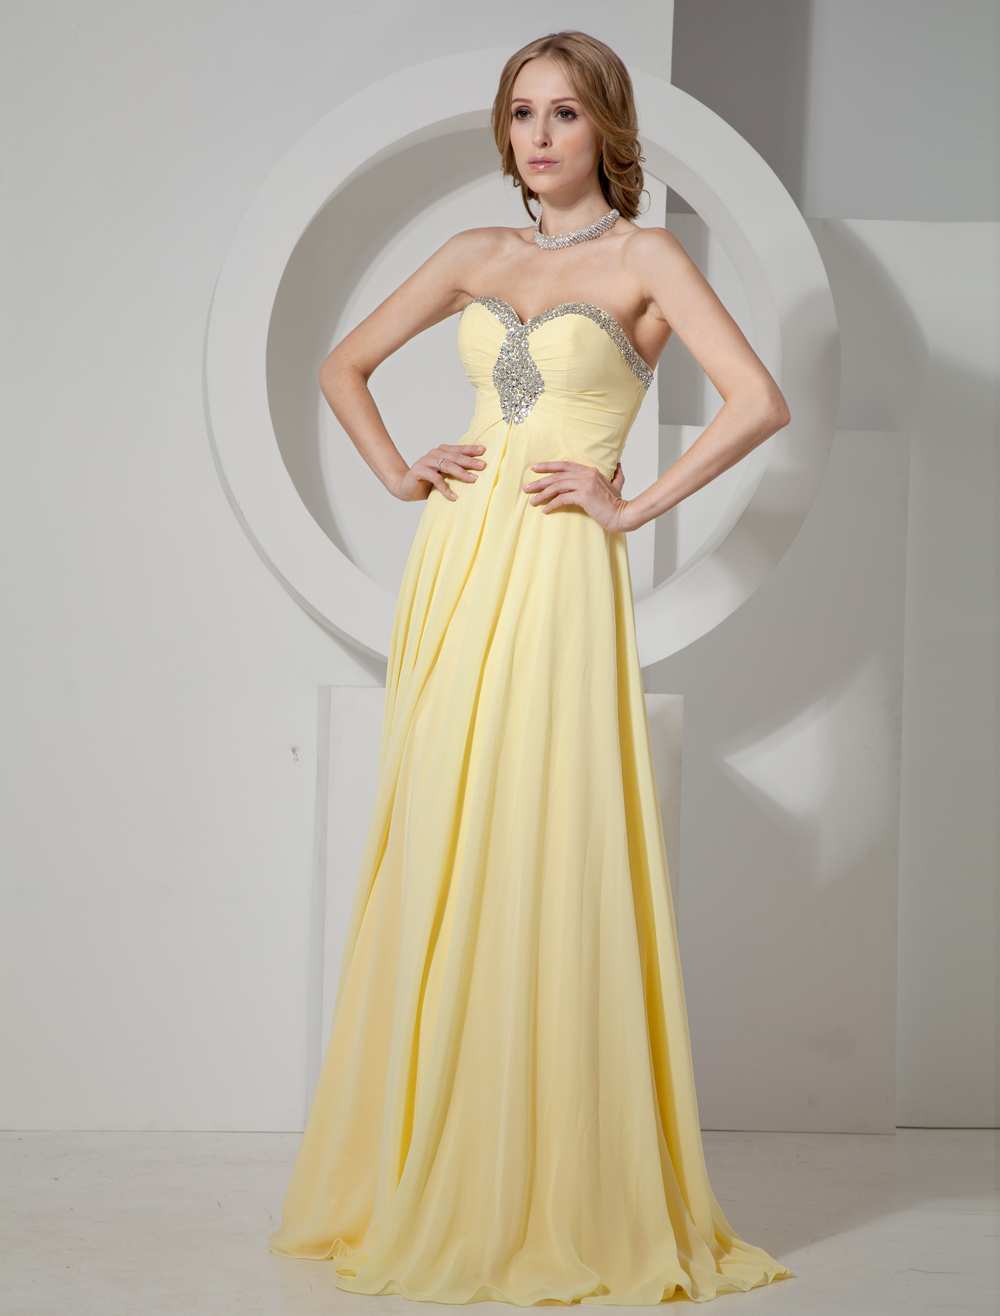 Daffodil Strapless Sweetheart Rhinestones Chiffon Women's Prom Dress